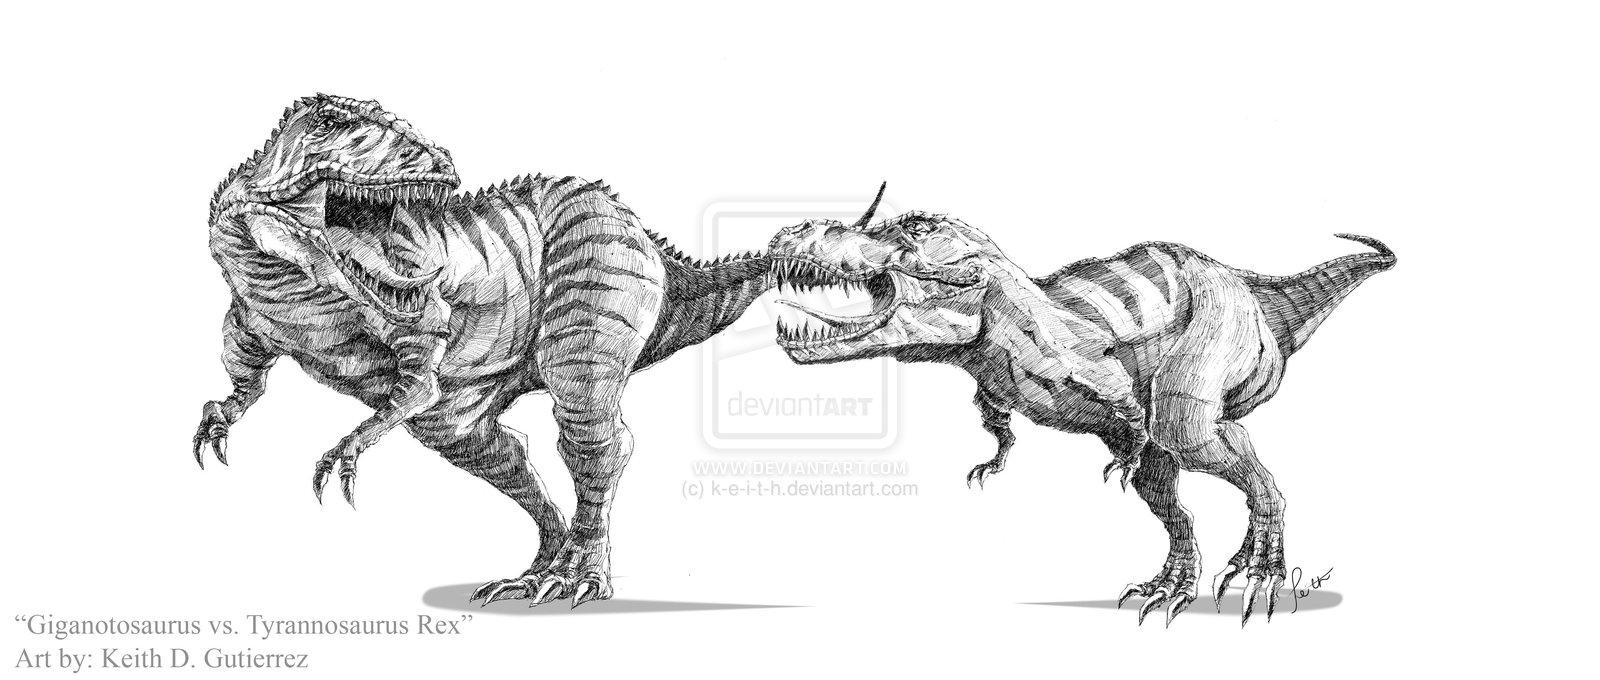 image giganotosaurus vs tyrannosaurus rex by k e i t h d5y3kzj jpg